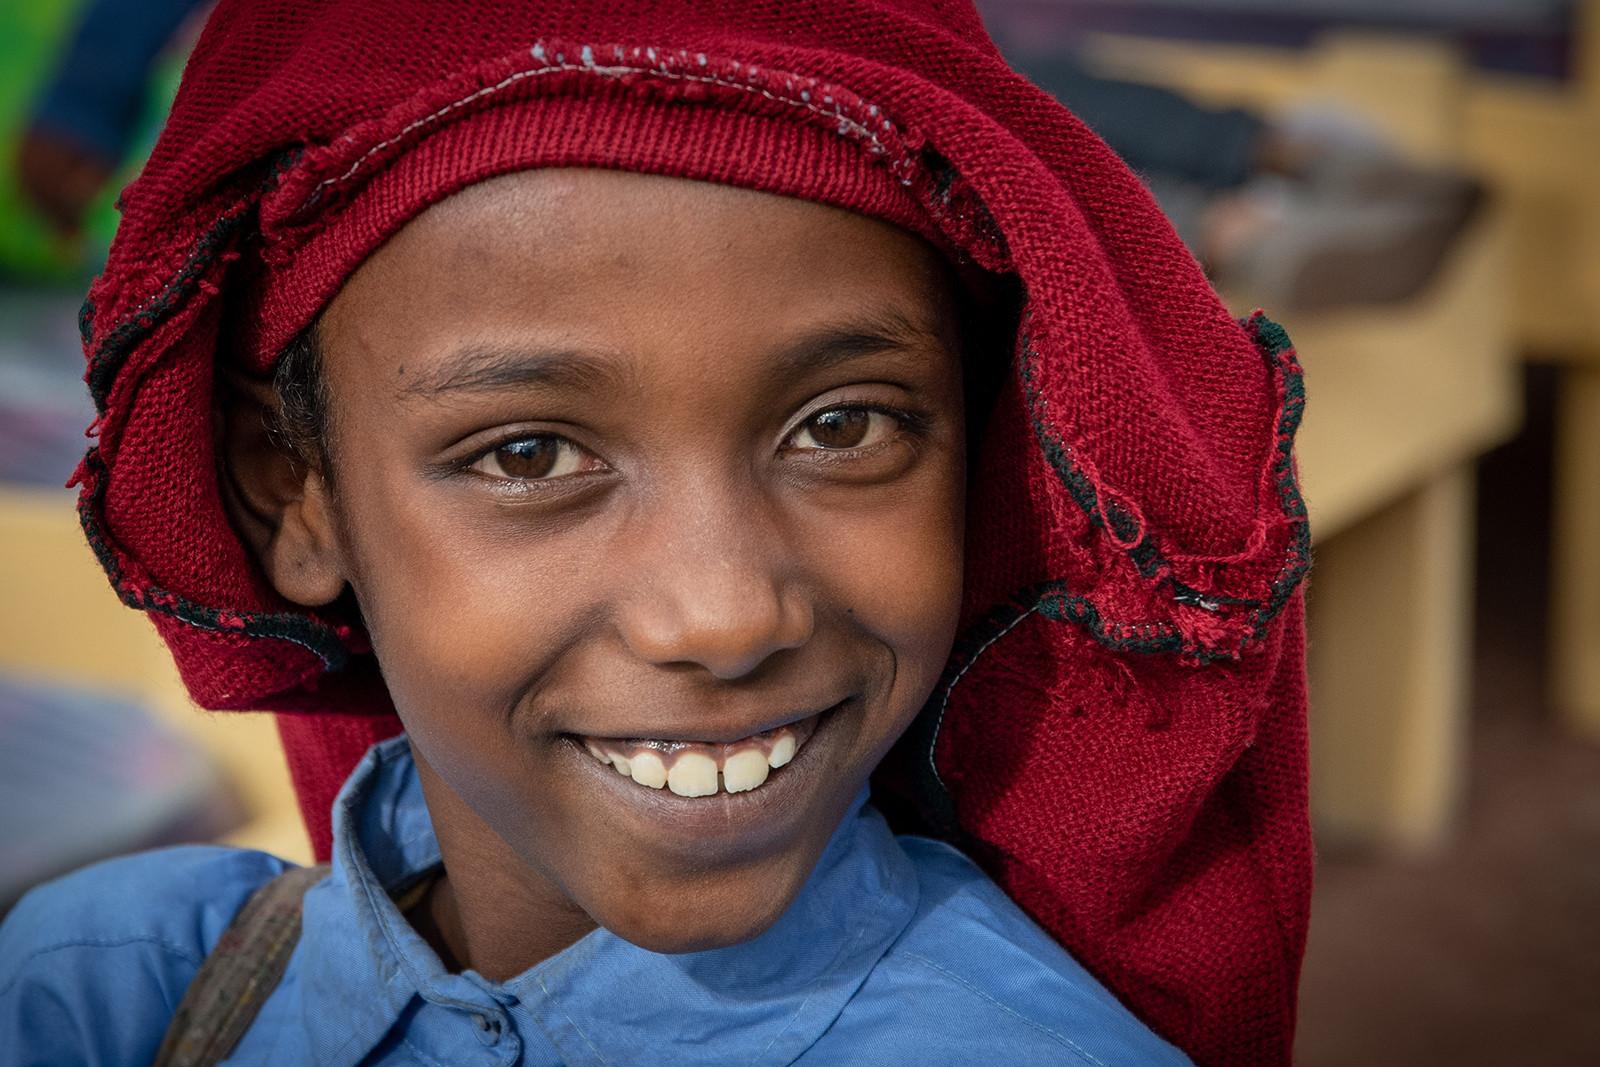 COLOUR - An Ethiopian Smile by Mark Jones (13 marks) - Starred